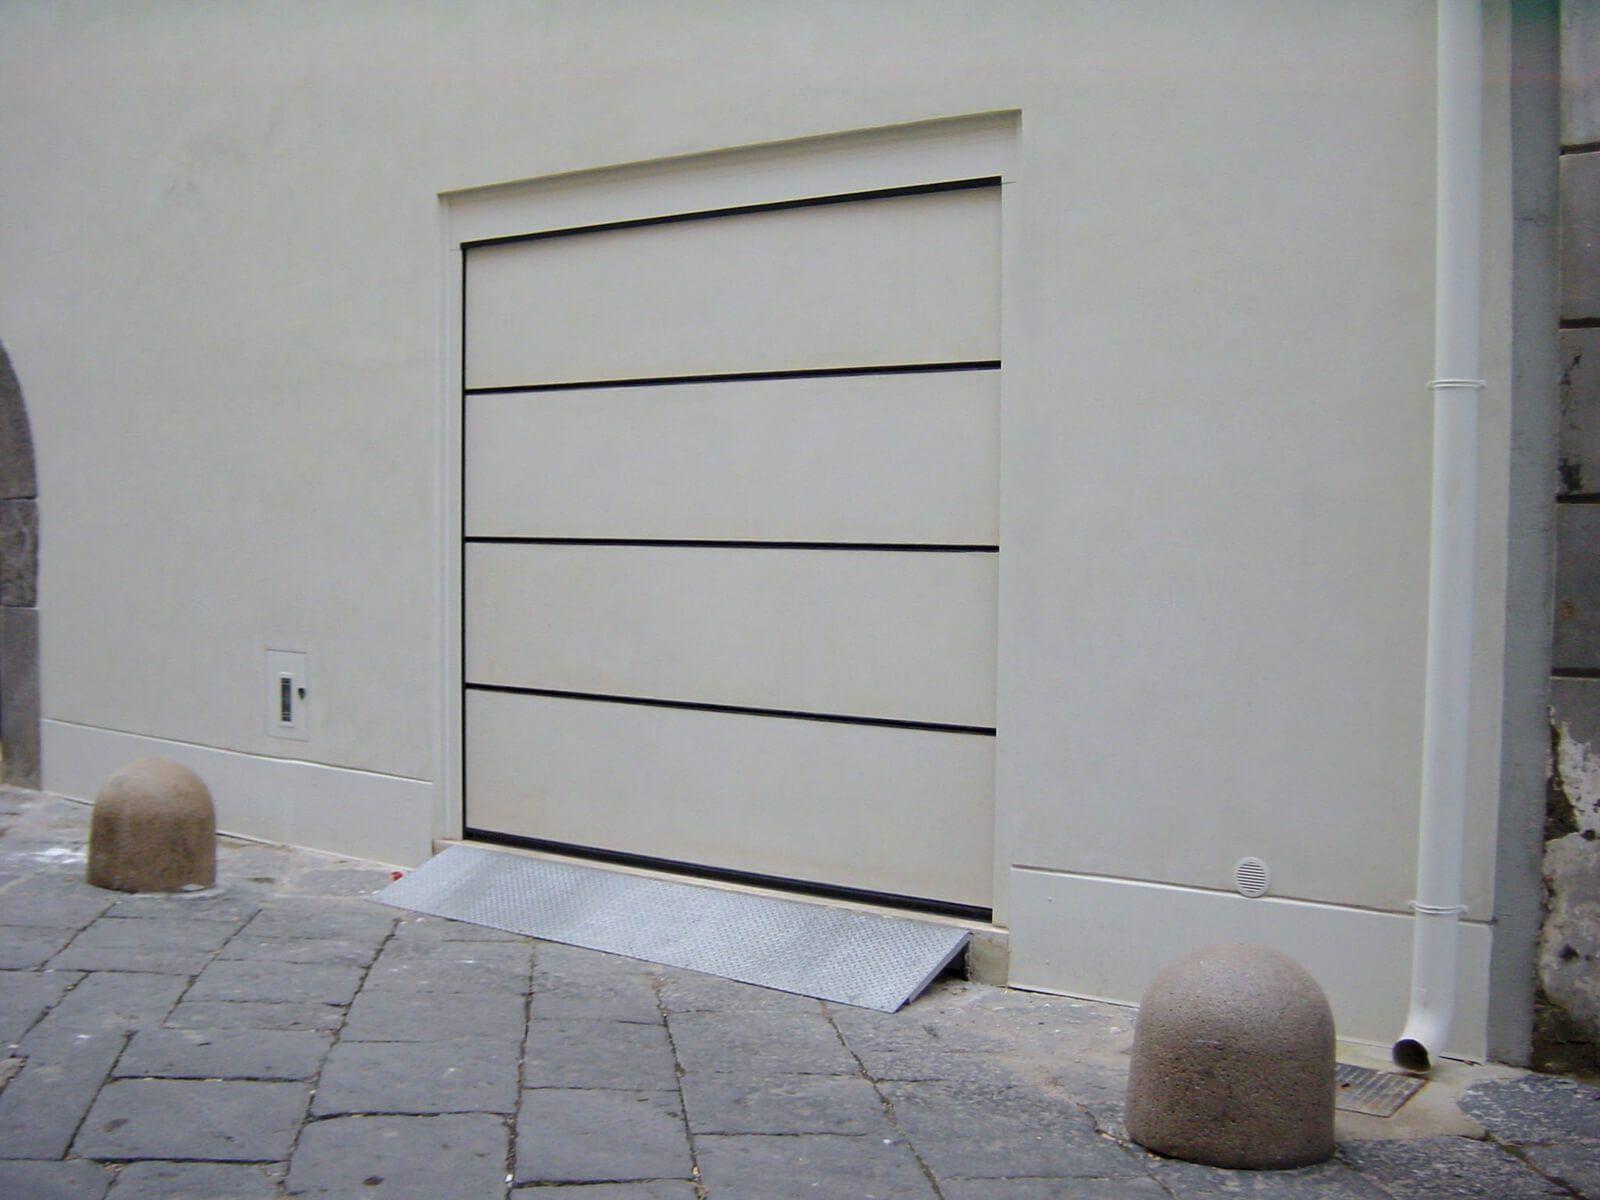 Le perle designer overhead garage doors by breda are oneofakind